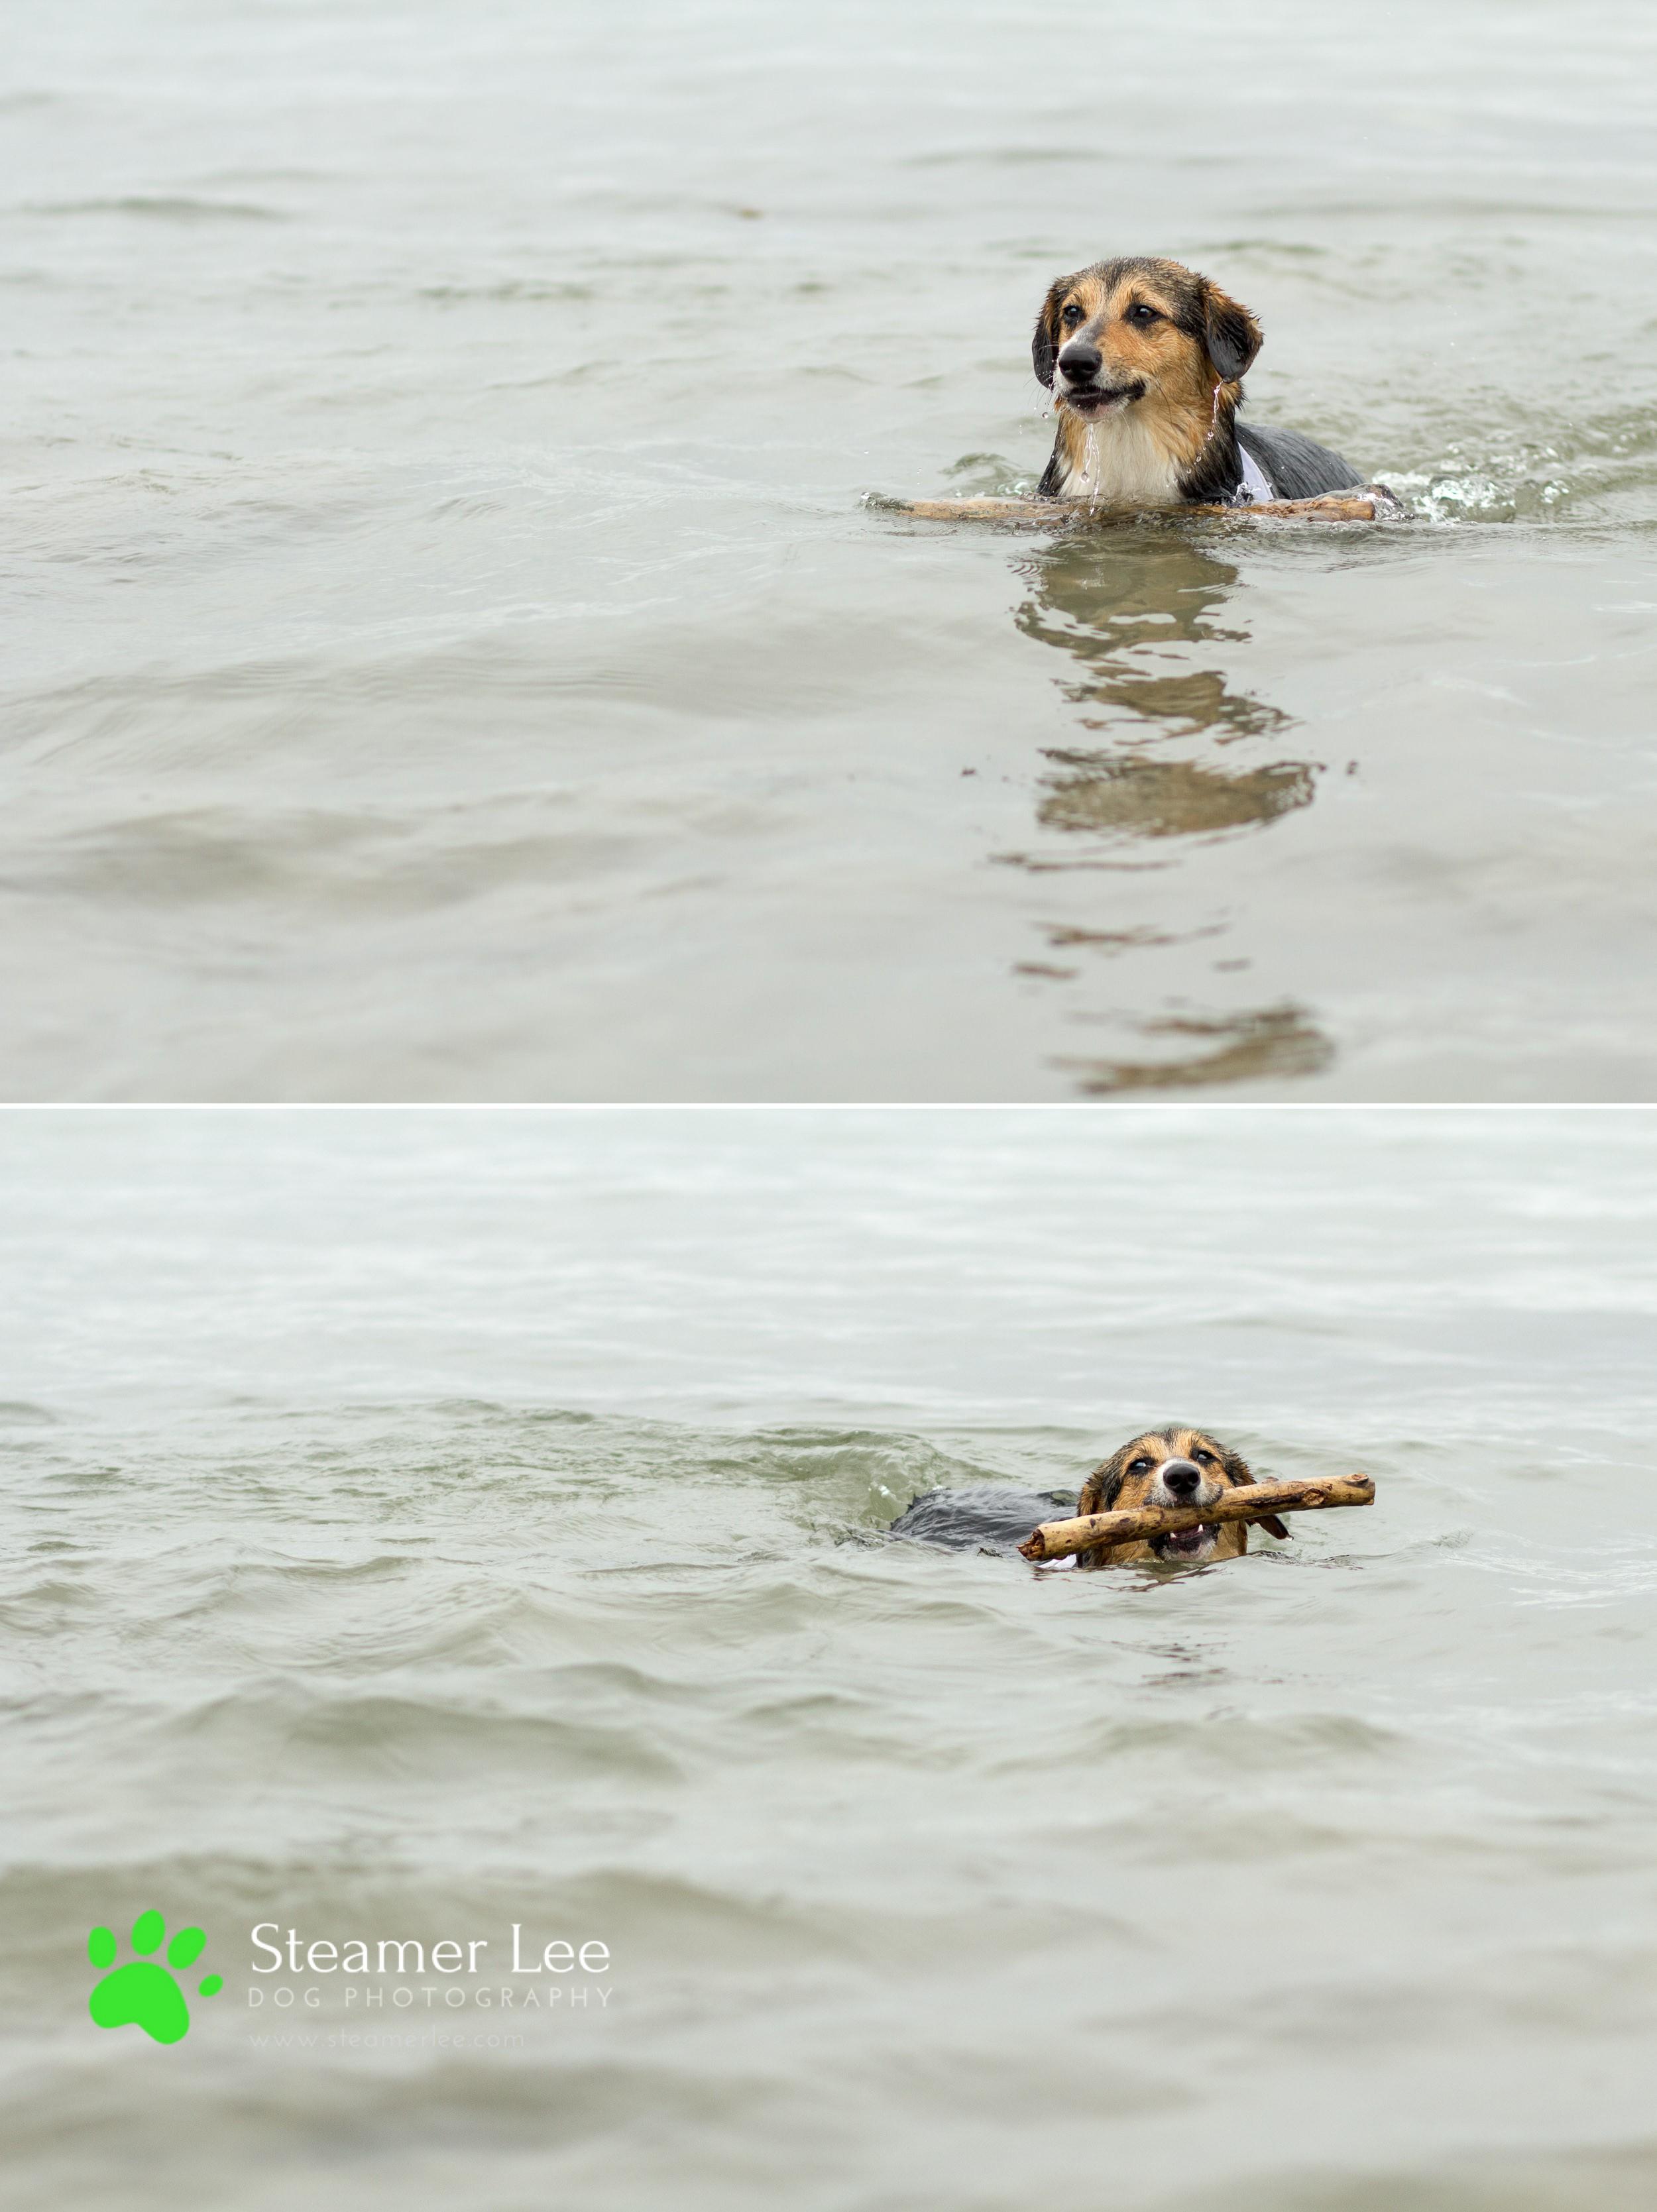 Steamer Lee Dog Photography - July 2017 So Cal Corgi Beach Day - Vol.2 - 9.jpg